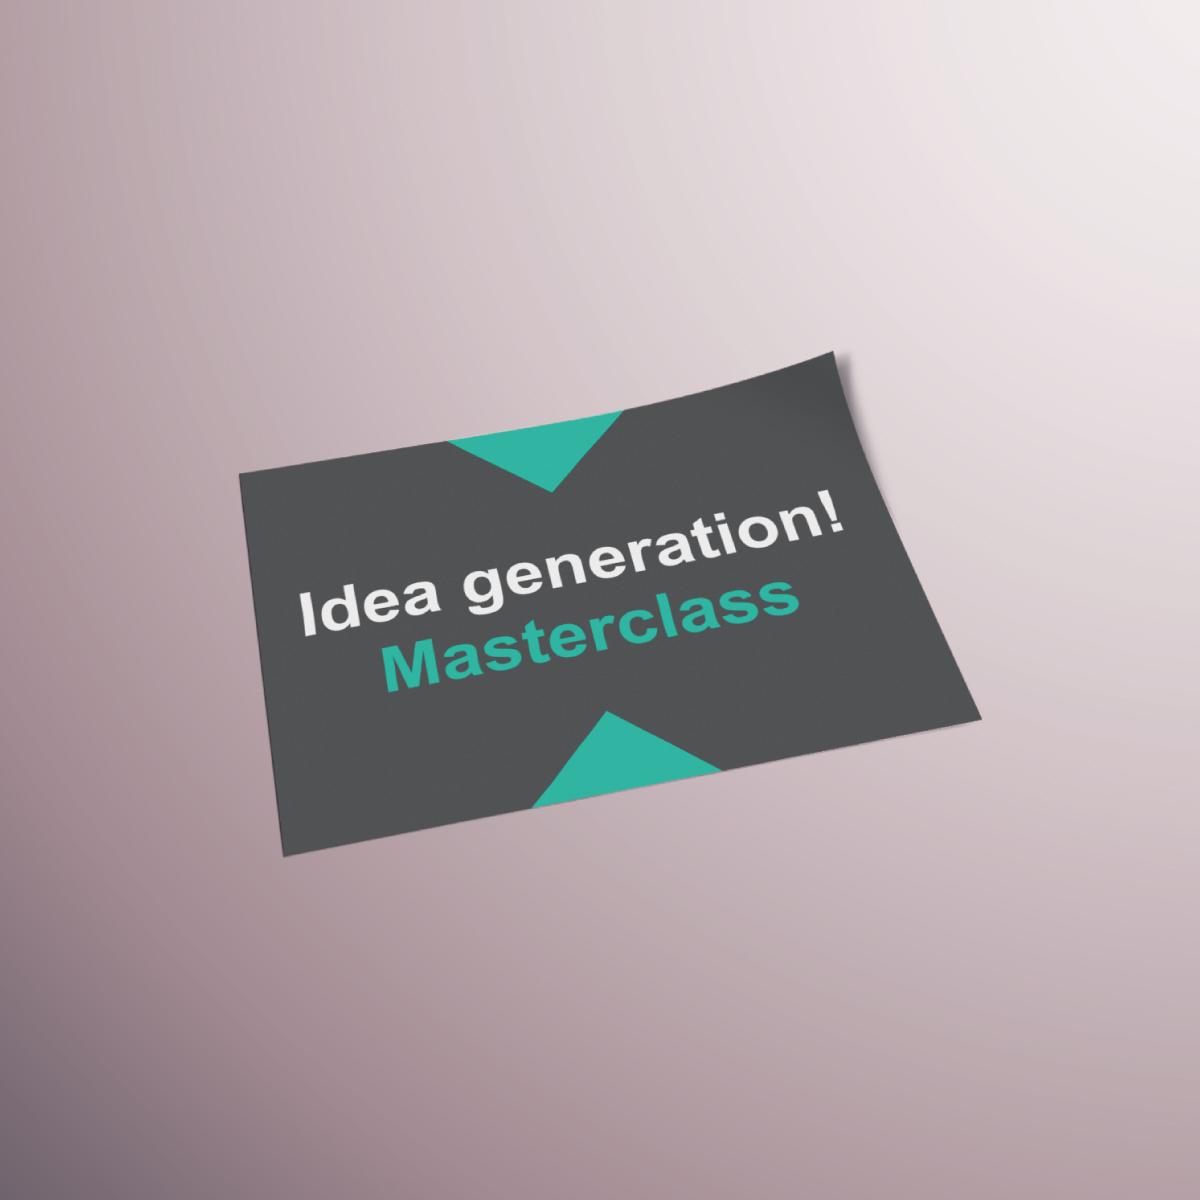 Uca idea generation masterclass by viviane williams